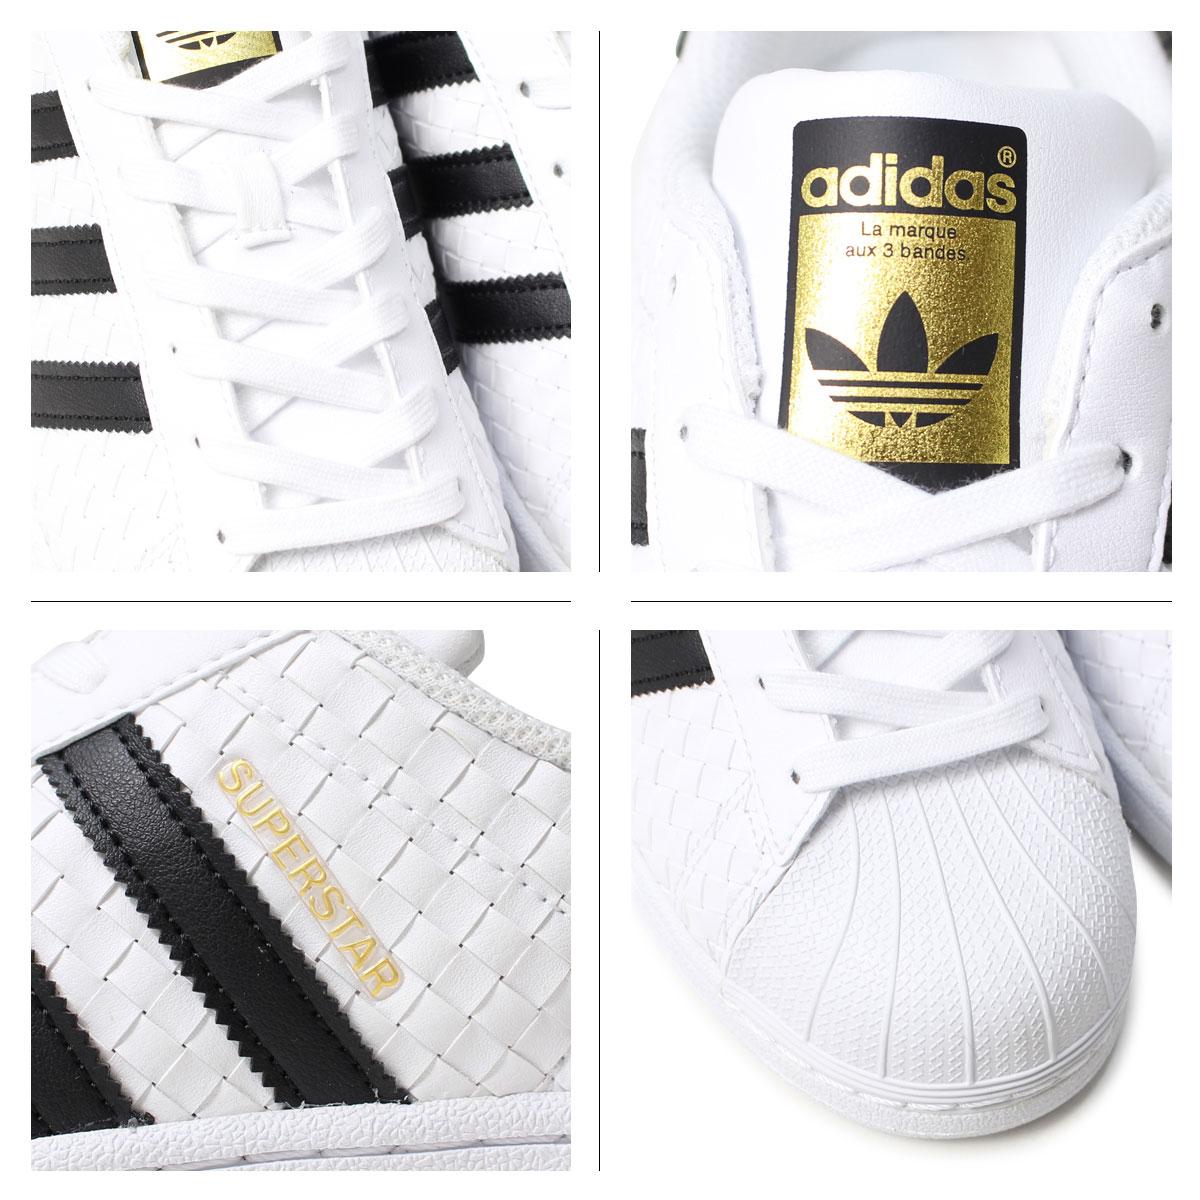 Scarpe Adidas Superstar Gold Coast mCSfLoh